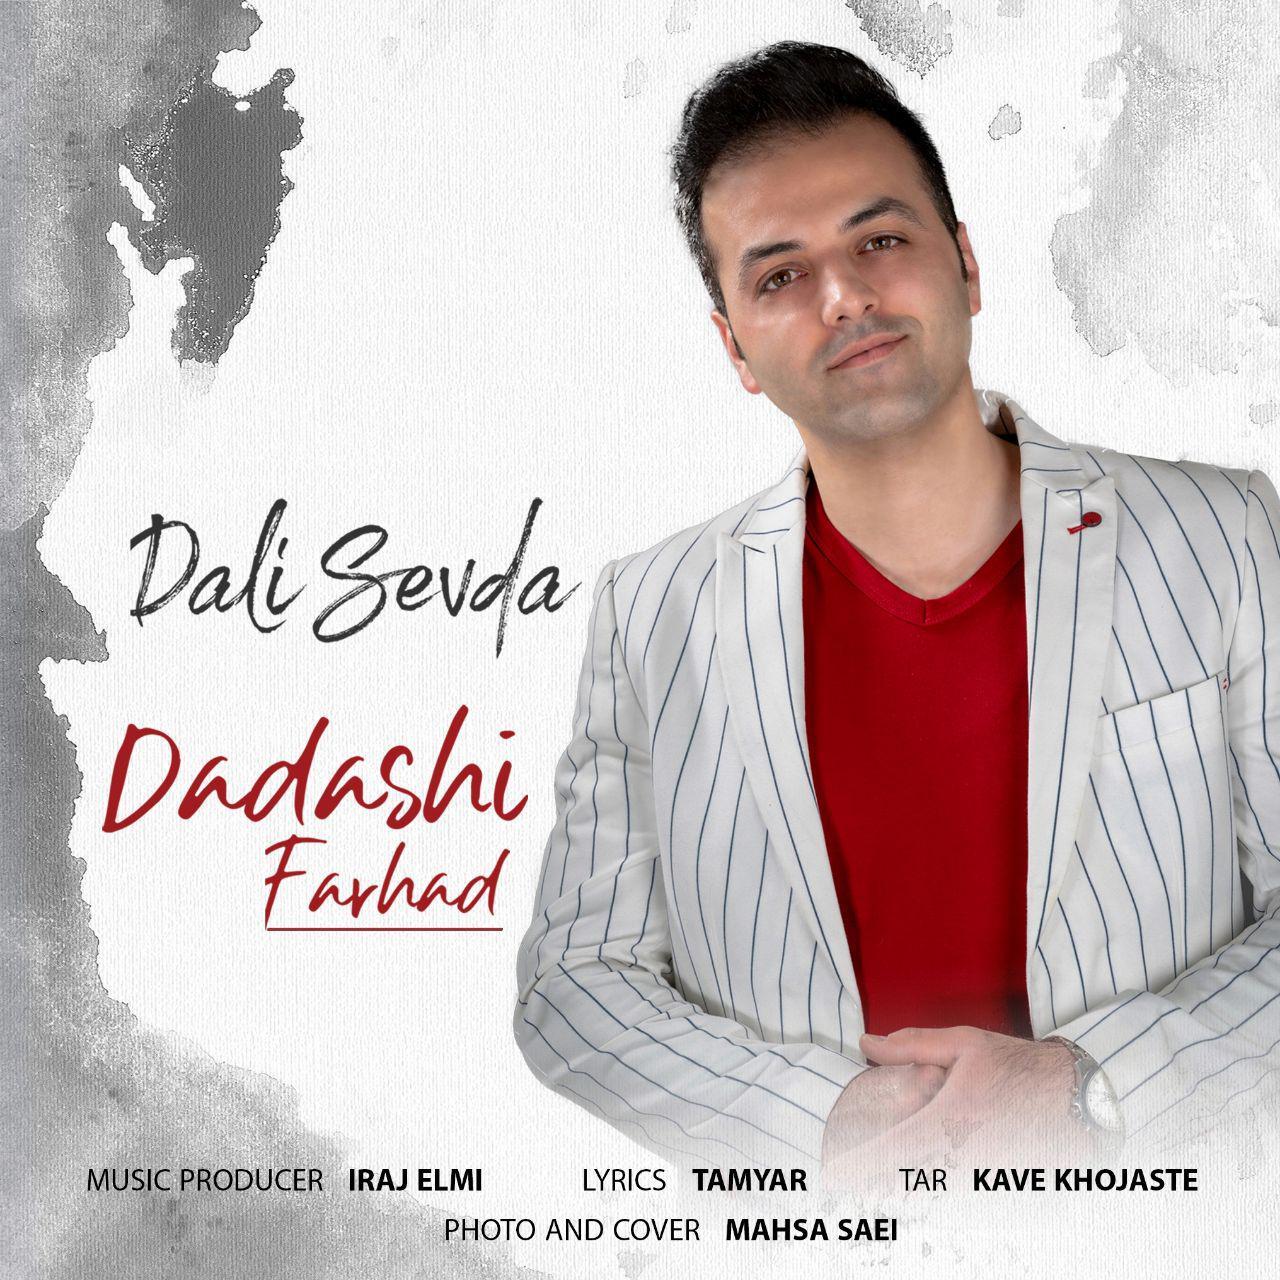 http://s8.picofile.com/file/8361503934/09Farhad_Dadashi_Dali_Sevda.jpg